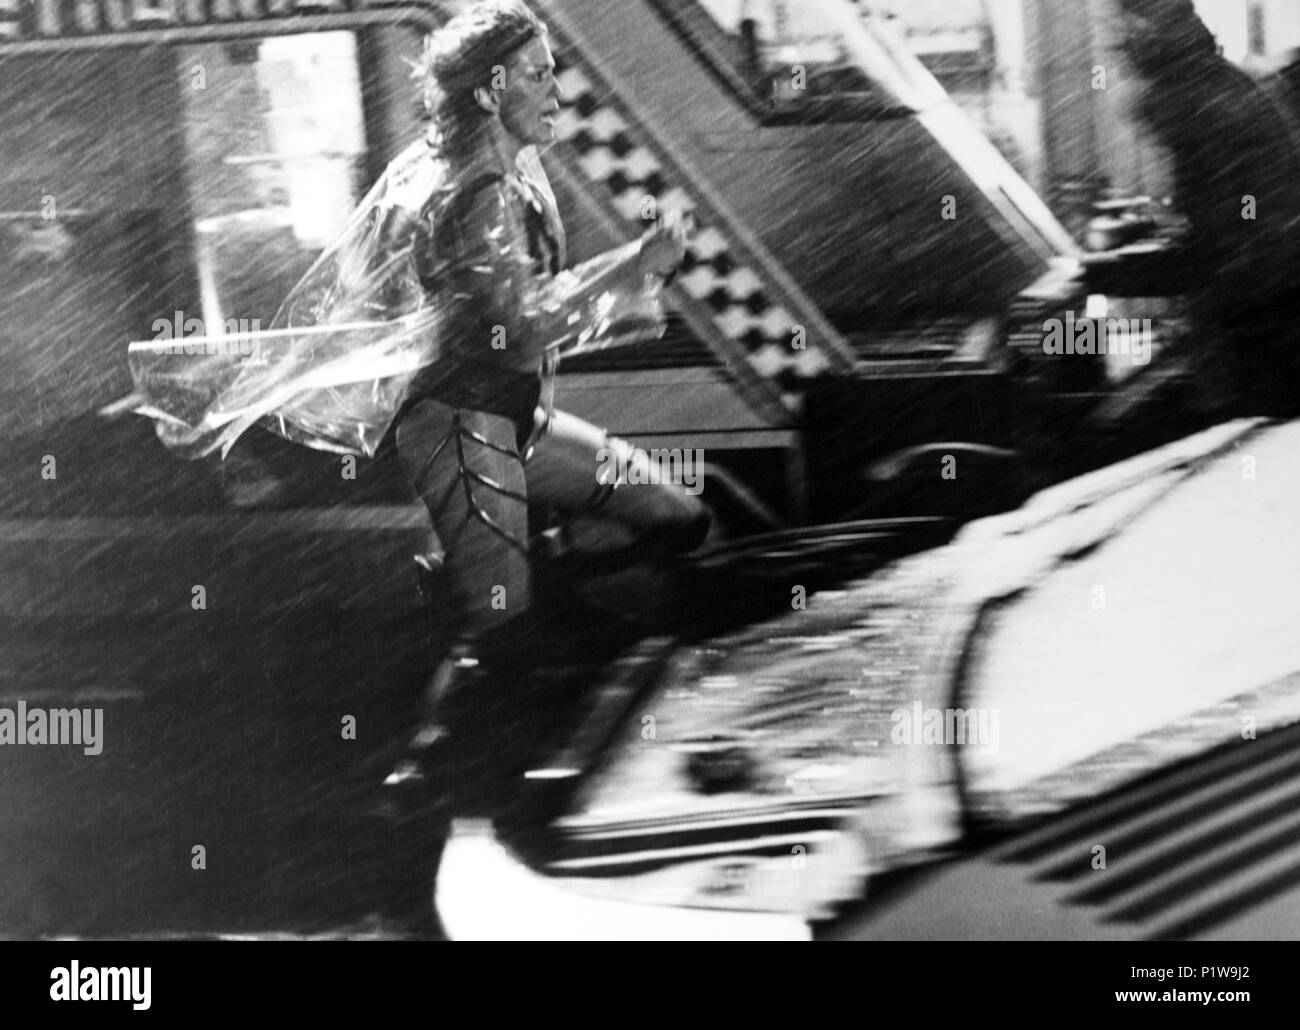 Original Film Title: BLADE RUNNER.  English Title: BLADE RUNNER.  Film Director: RIDLEY SCOTT.  Year: 1982.  Stars: JOANNA CASSIDY. Credit: LADD COMPANY/WARNER BROS / Album - Stock Image